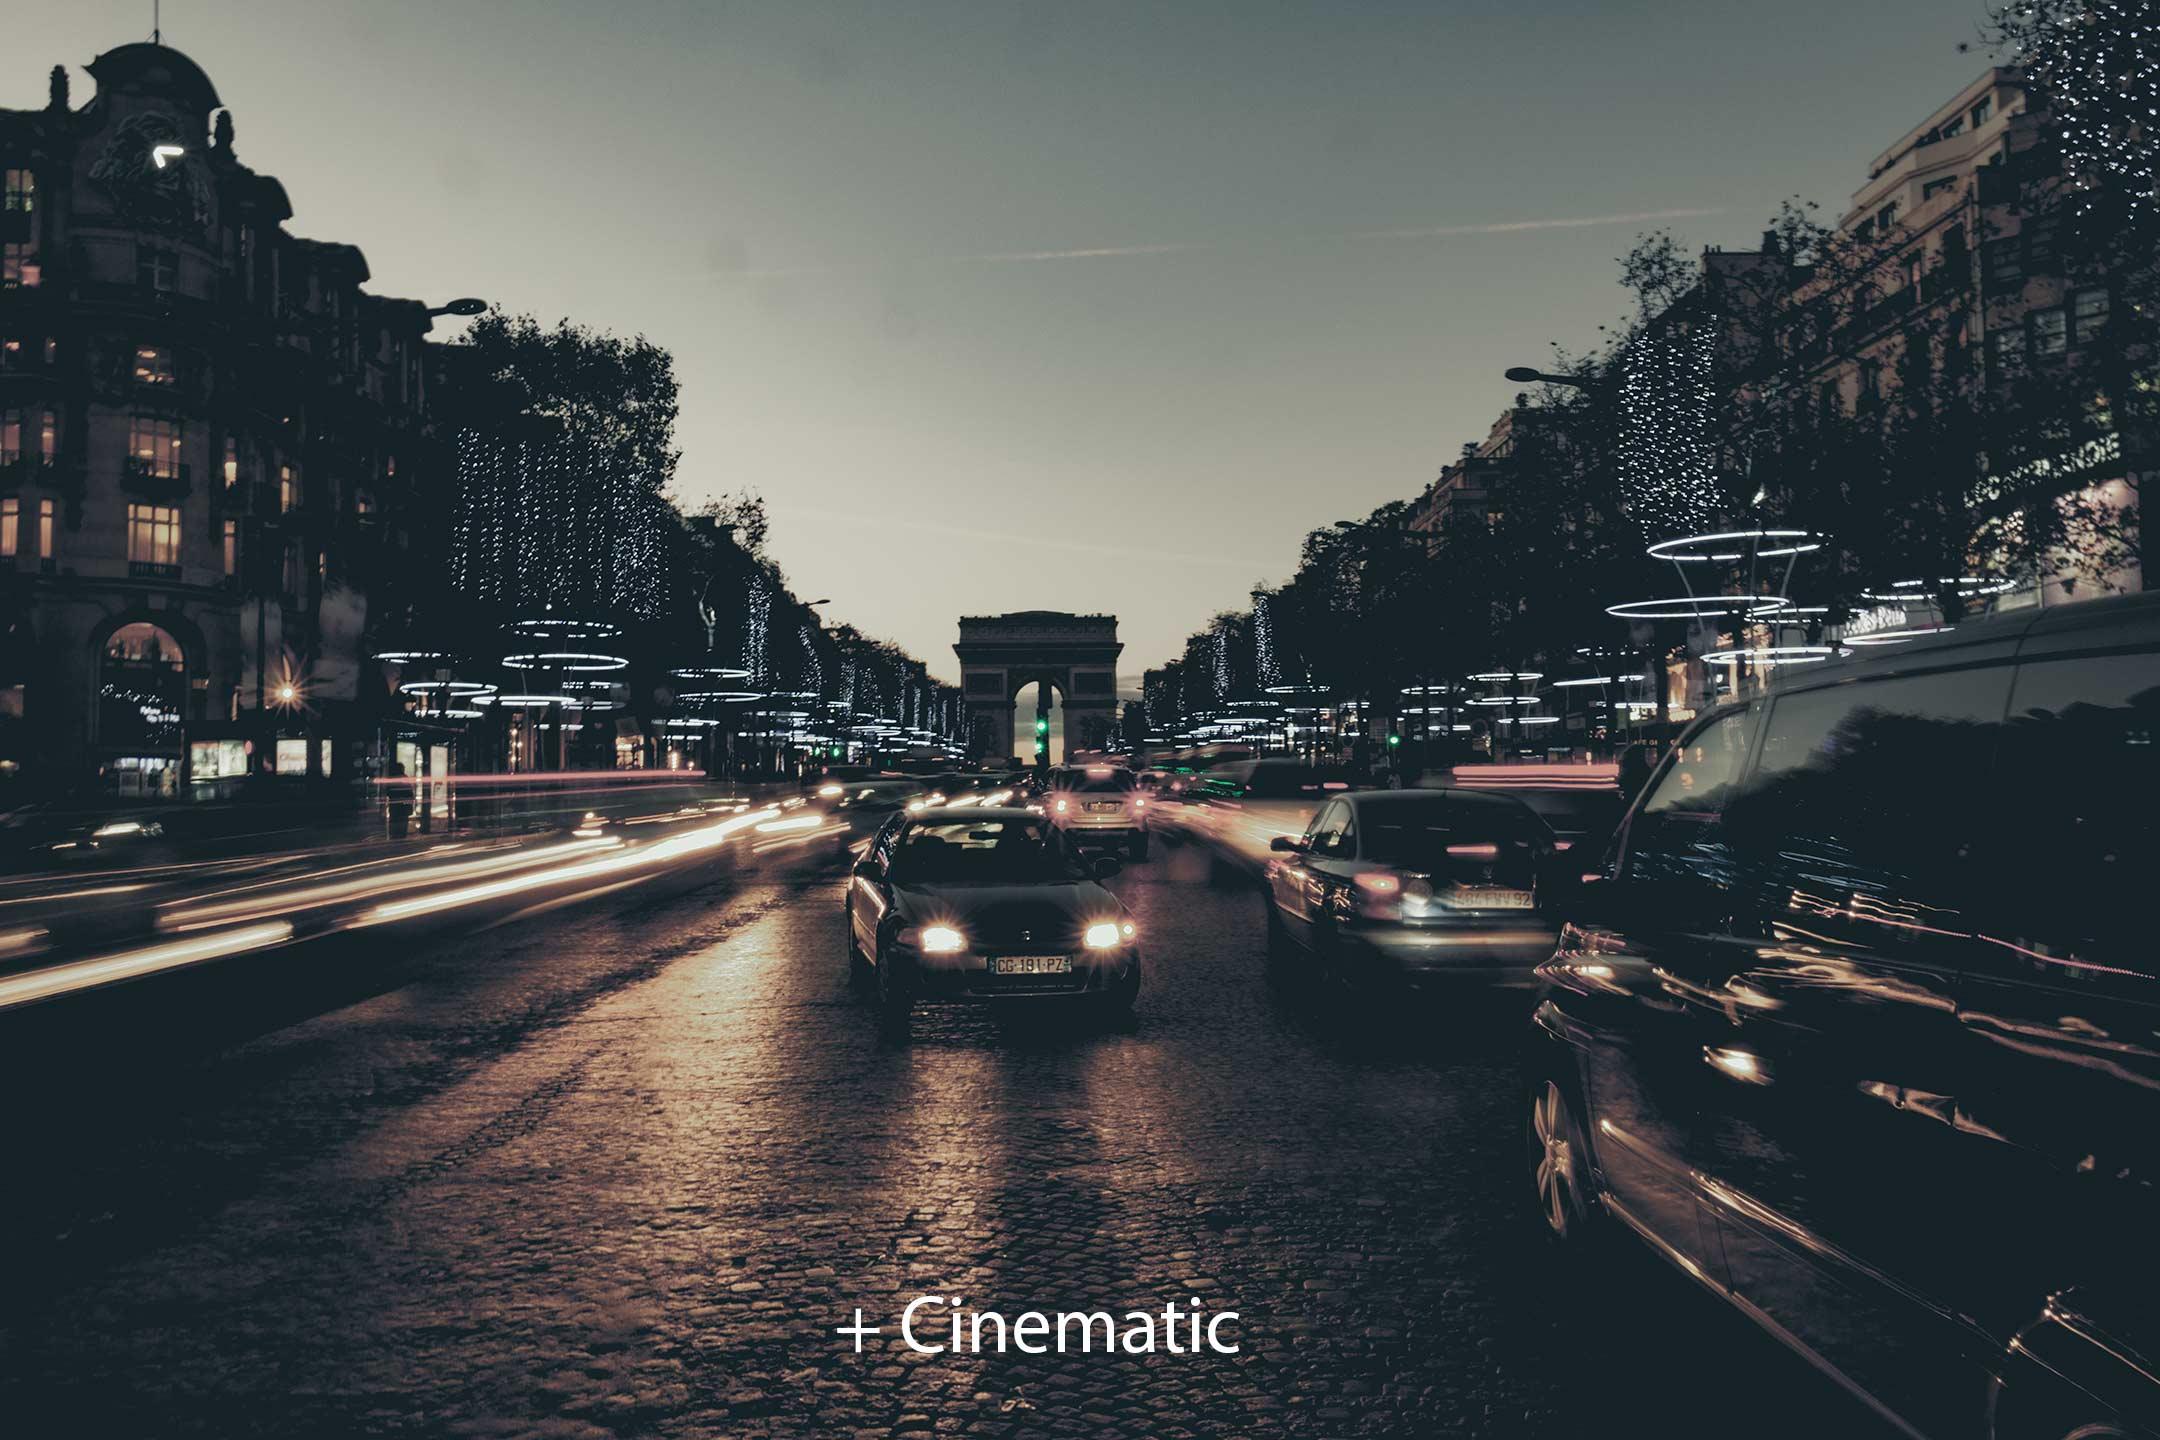 Cinematic 1.jpg